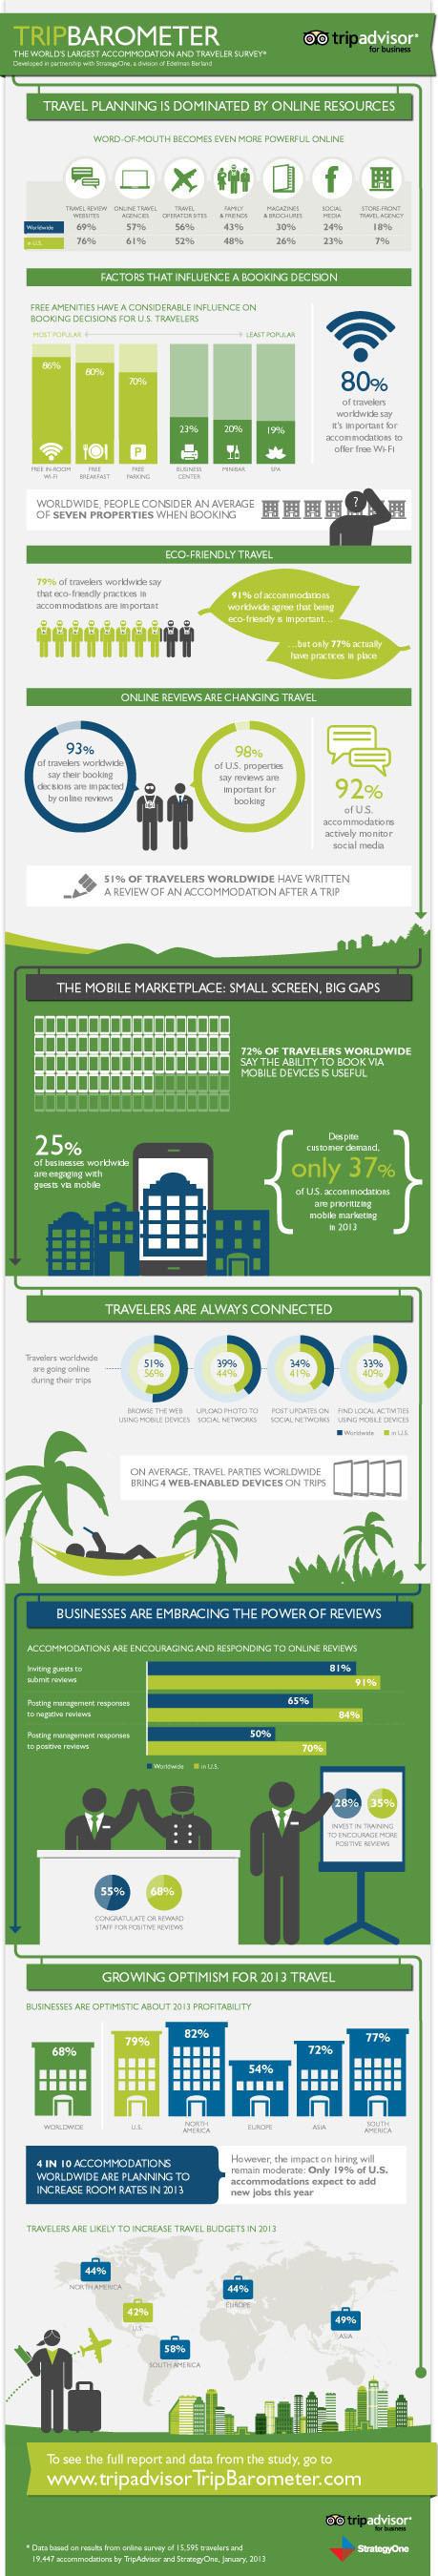 TripAdvisor Global Study Reveals Traveler Spending and Accommodation Profitability Expected To Rise